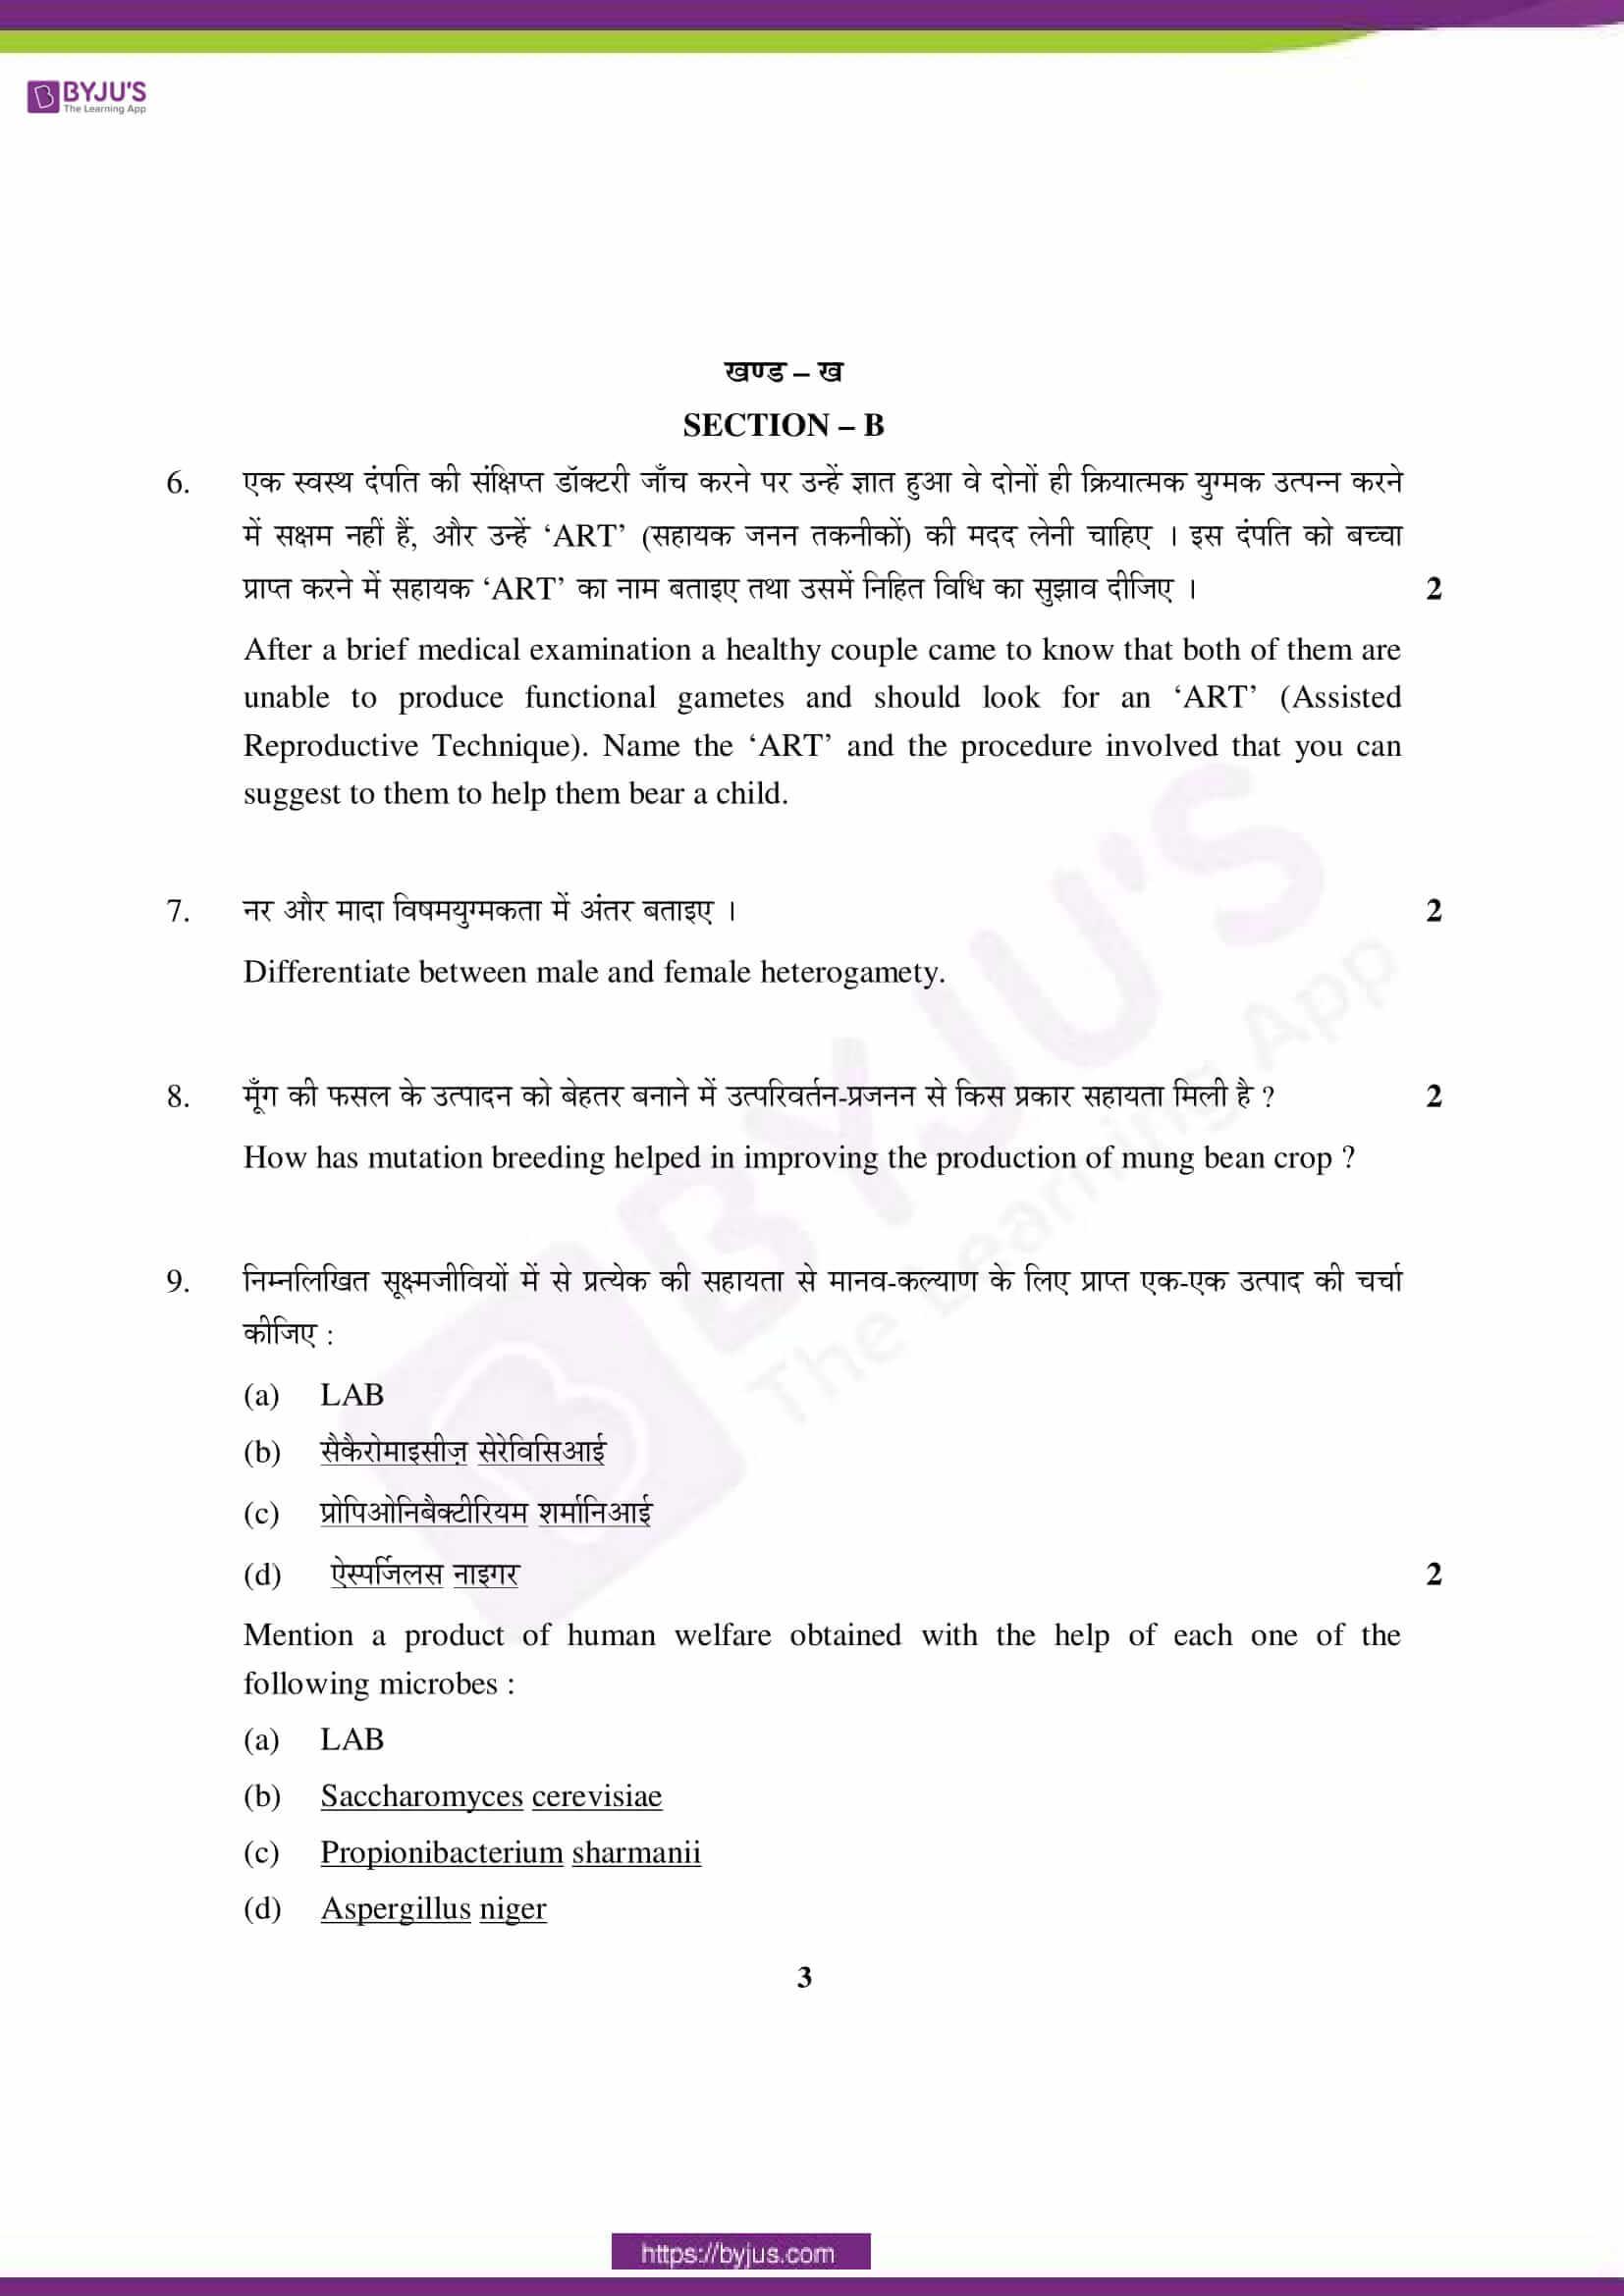 cbse class 12 qs paper 2015 bio set 1